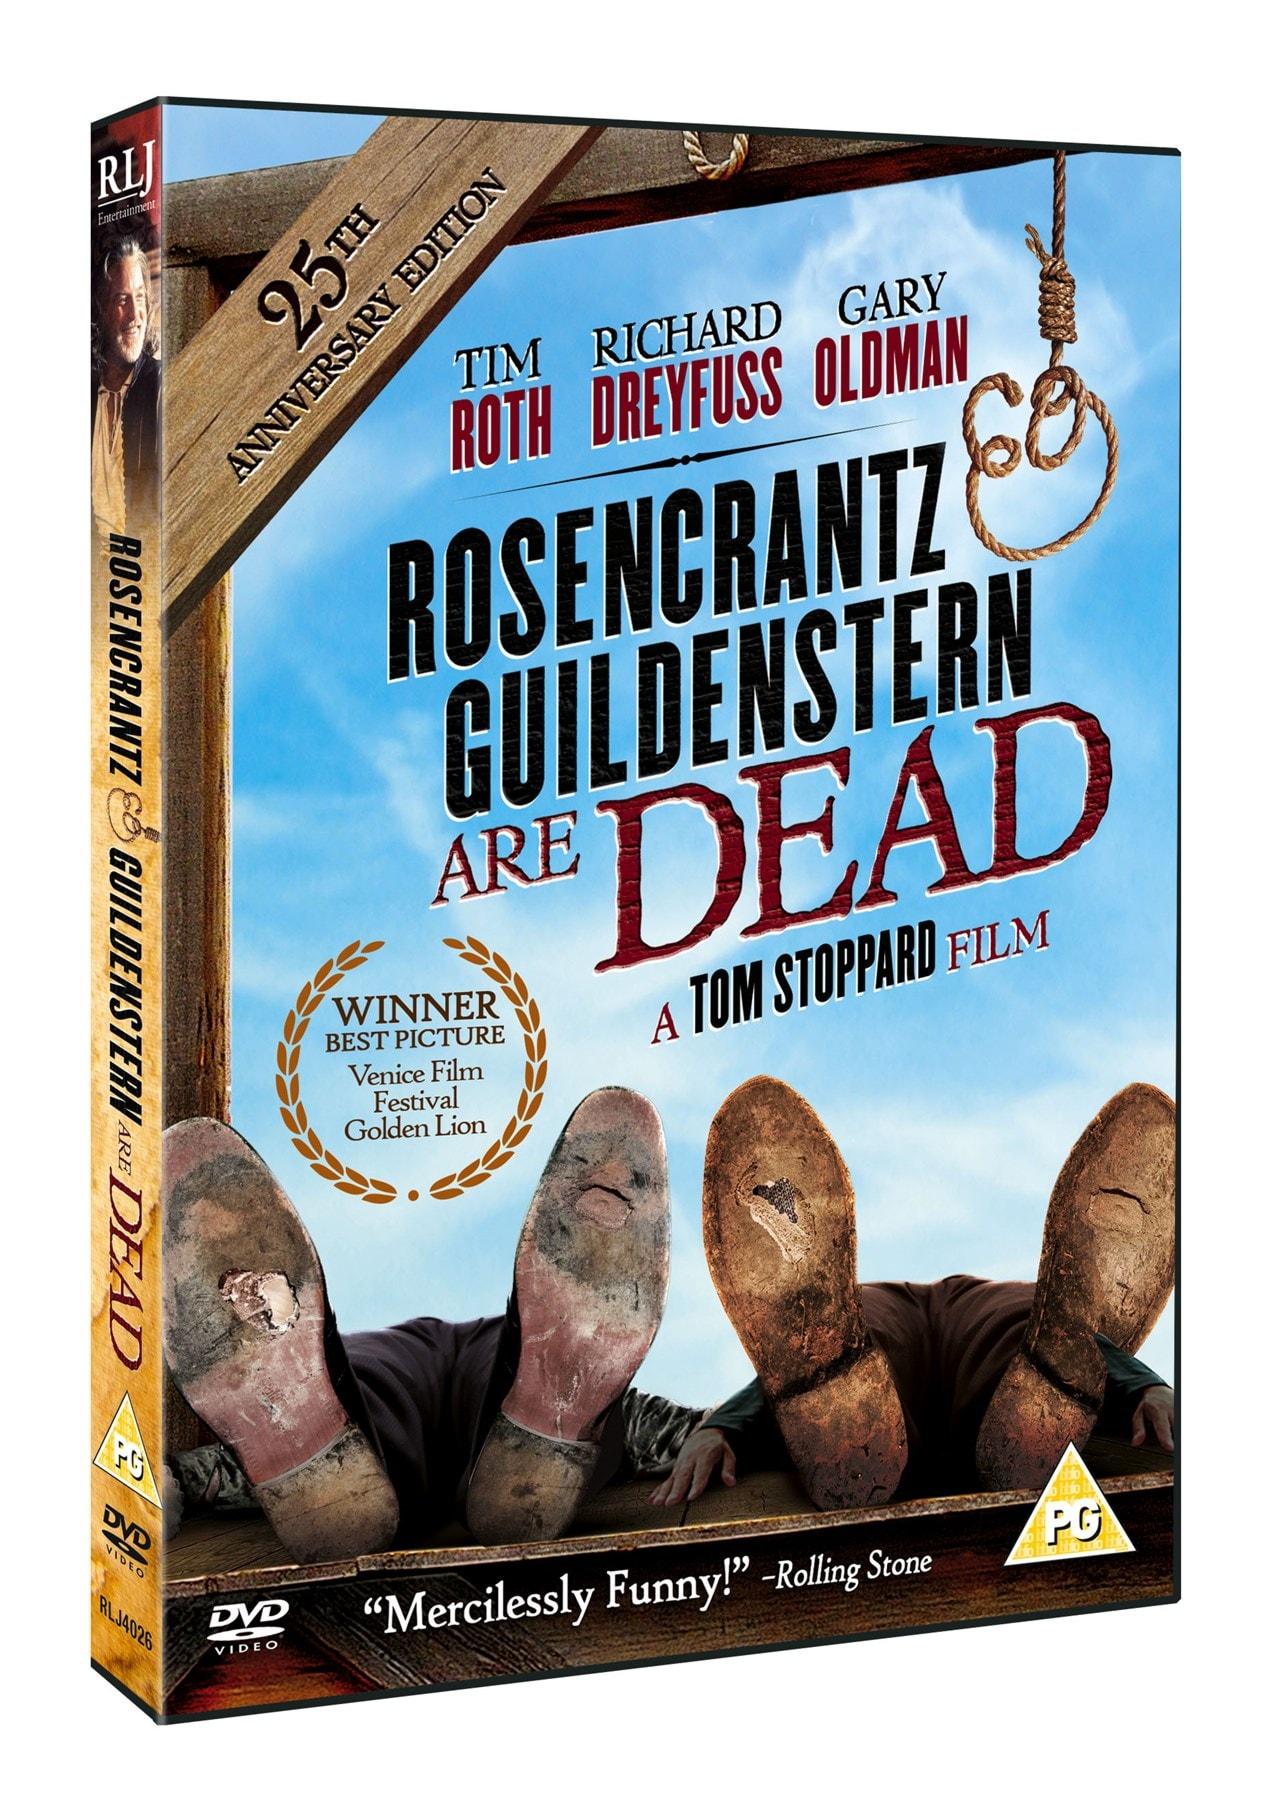 Rosencrantz and Guildenstern Are Dead - 1